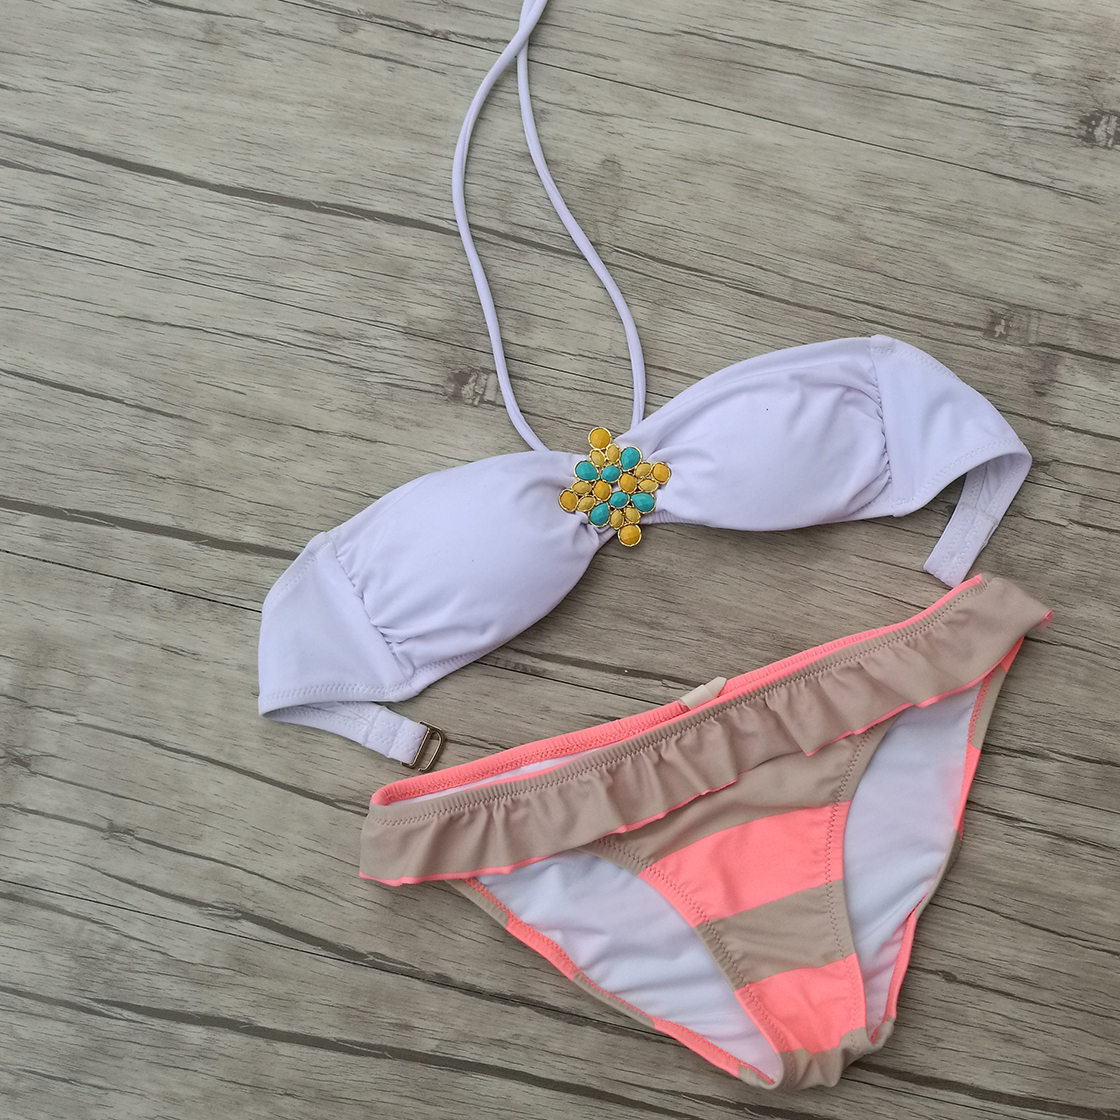 Women Thong Bottom Bikini White Diamond Pink Swimsuits Brazilian Biquini Swimwear saida de praia Sexy Secret maillot de bain